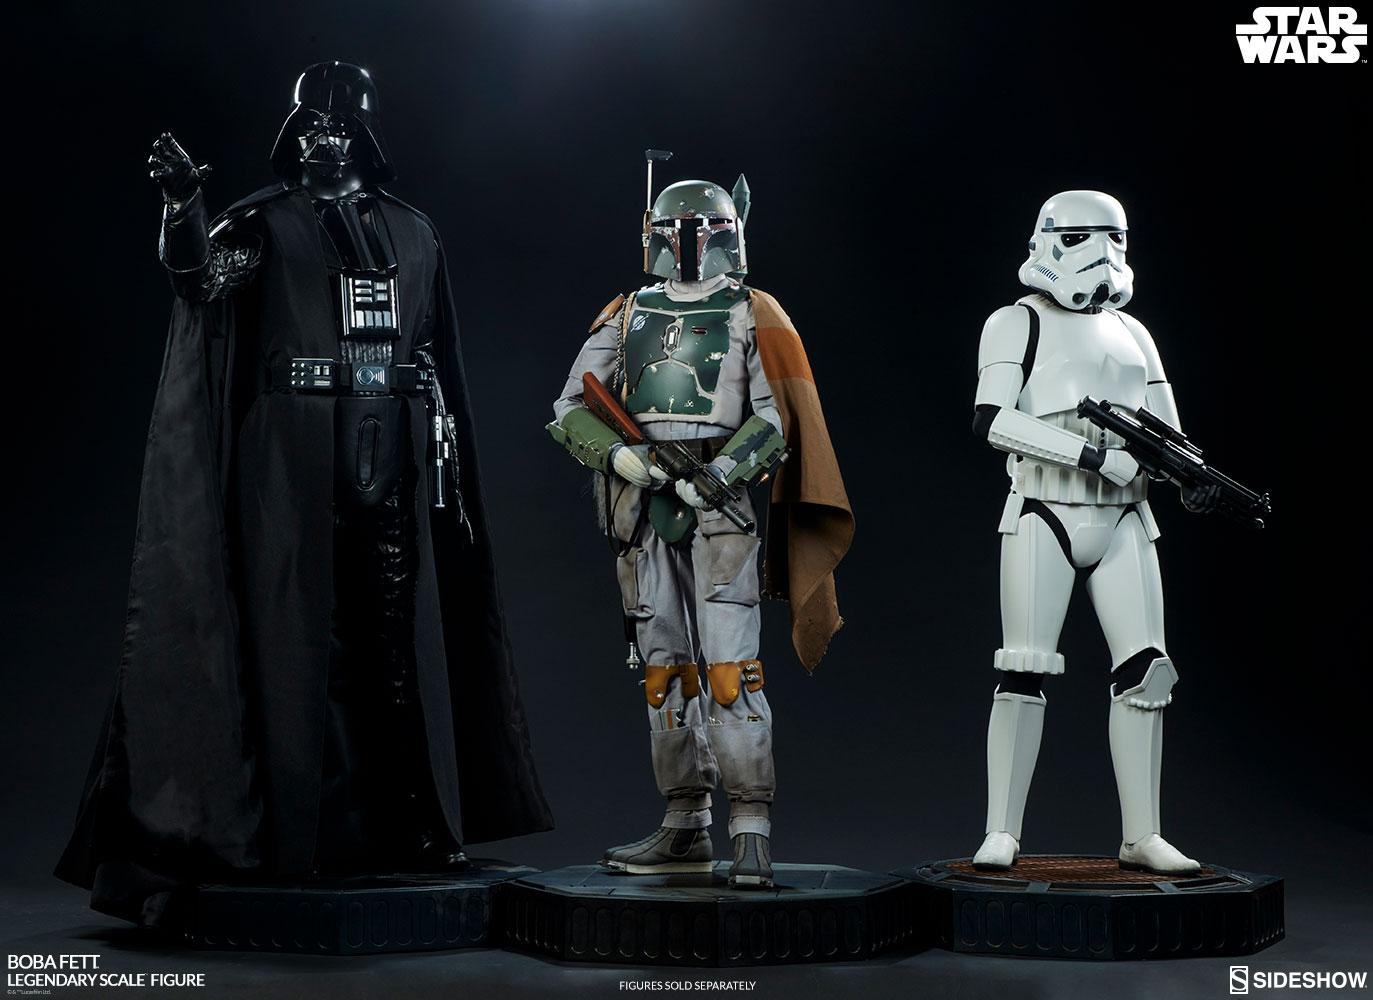 SW-Boba-fett-legendary-scale-figure-07